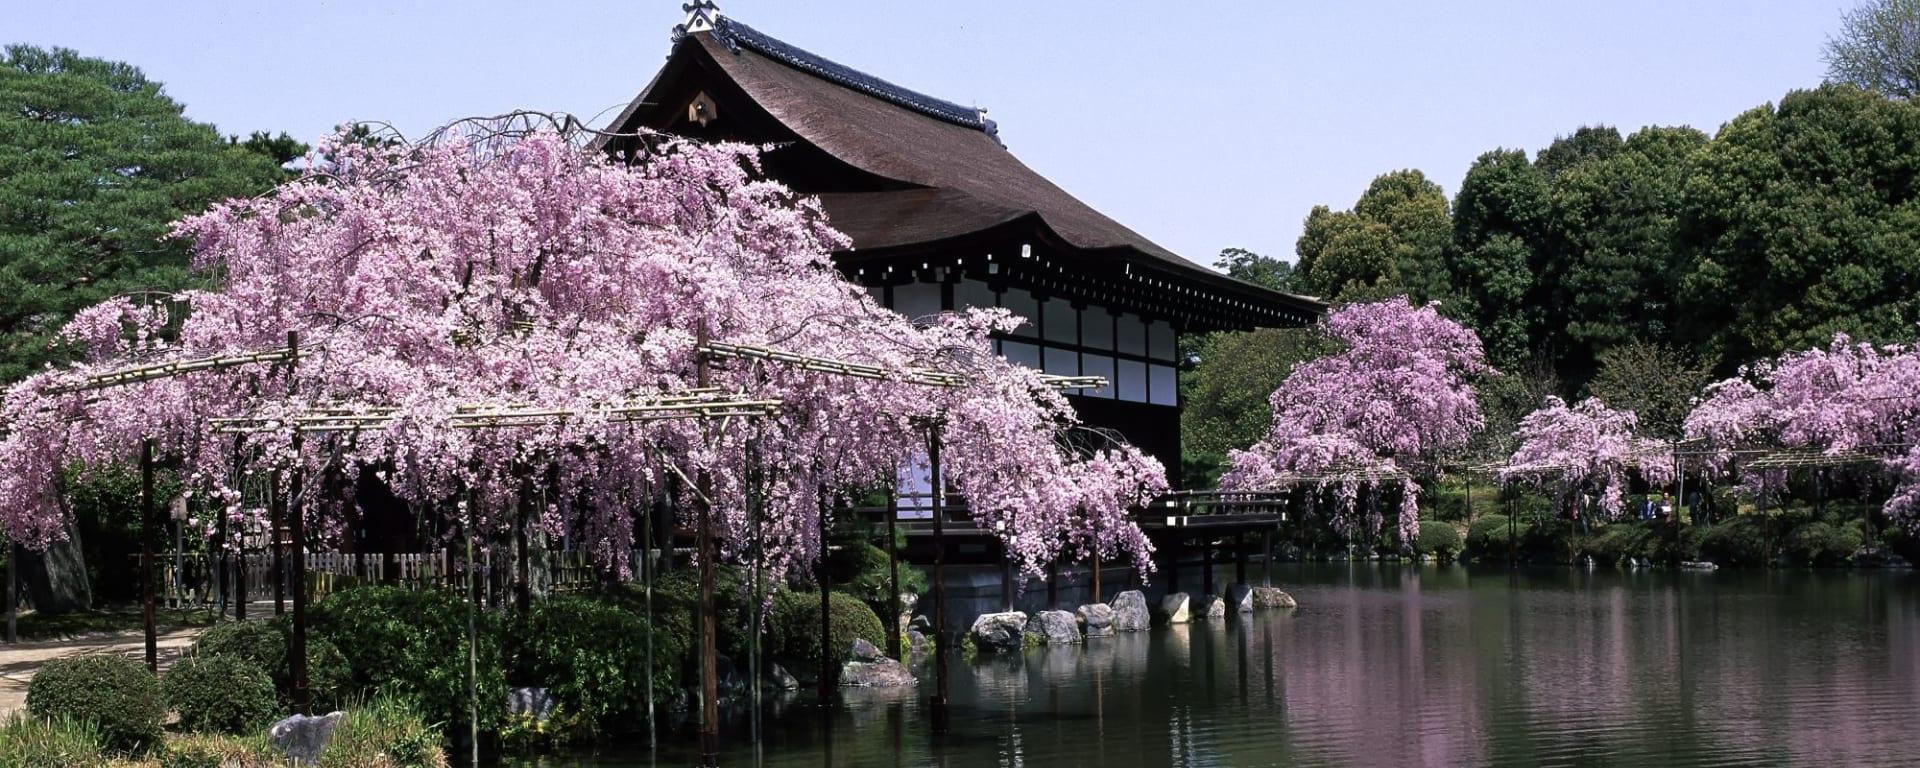 Klassisches Japan ab Tokio: Kyoto Heian Shrine